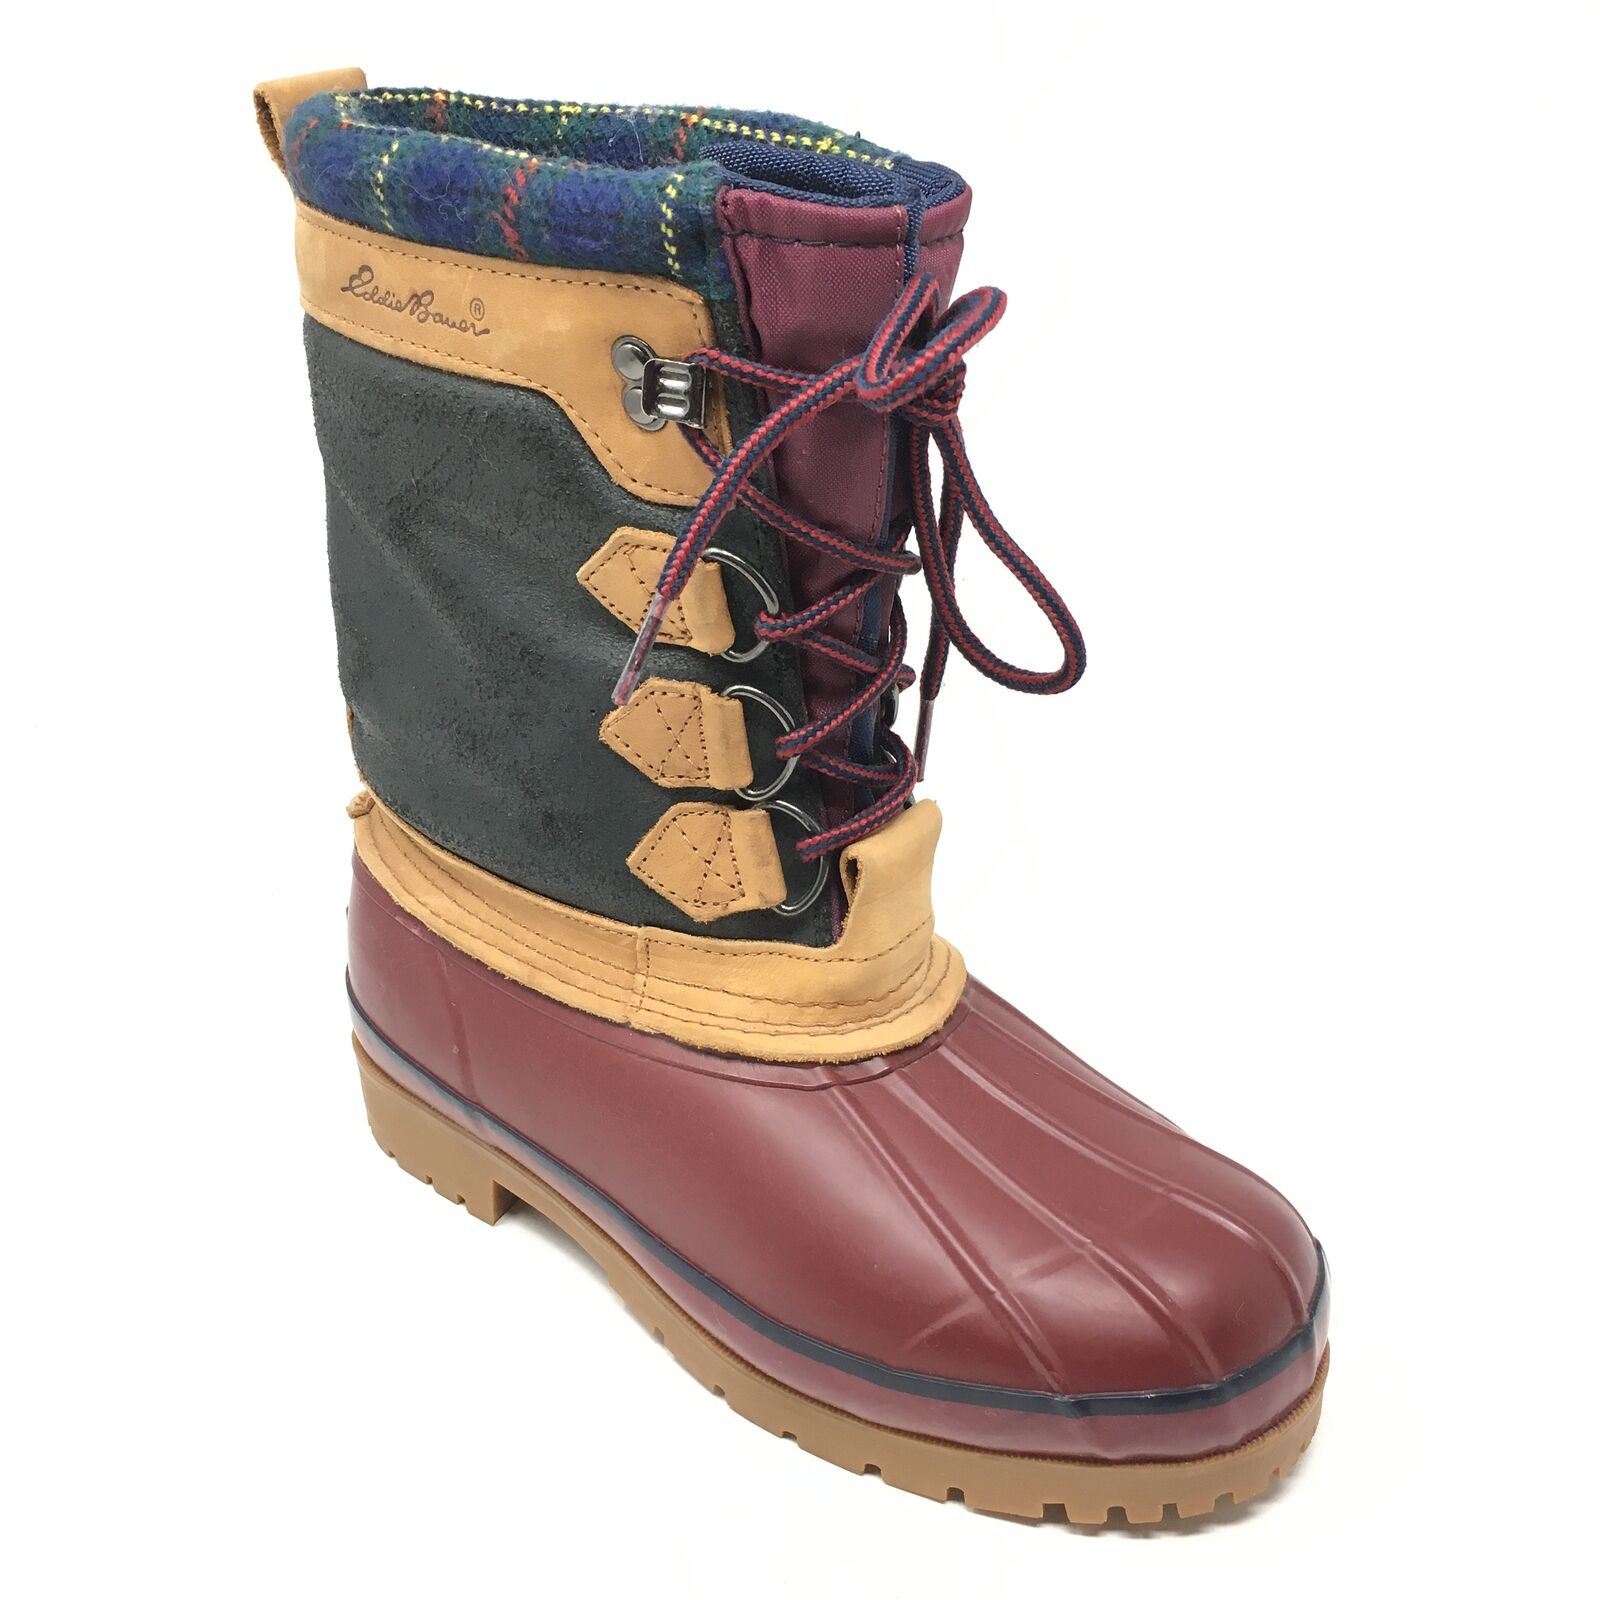 Women's Eddie Bauer Waterproof Winter Boots shoes Size 7M Red Brown Faux Fur Y9